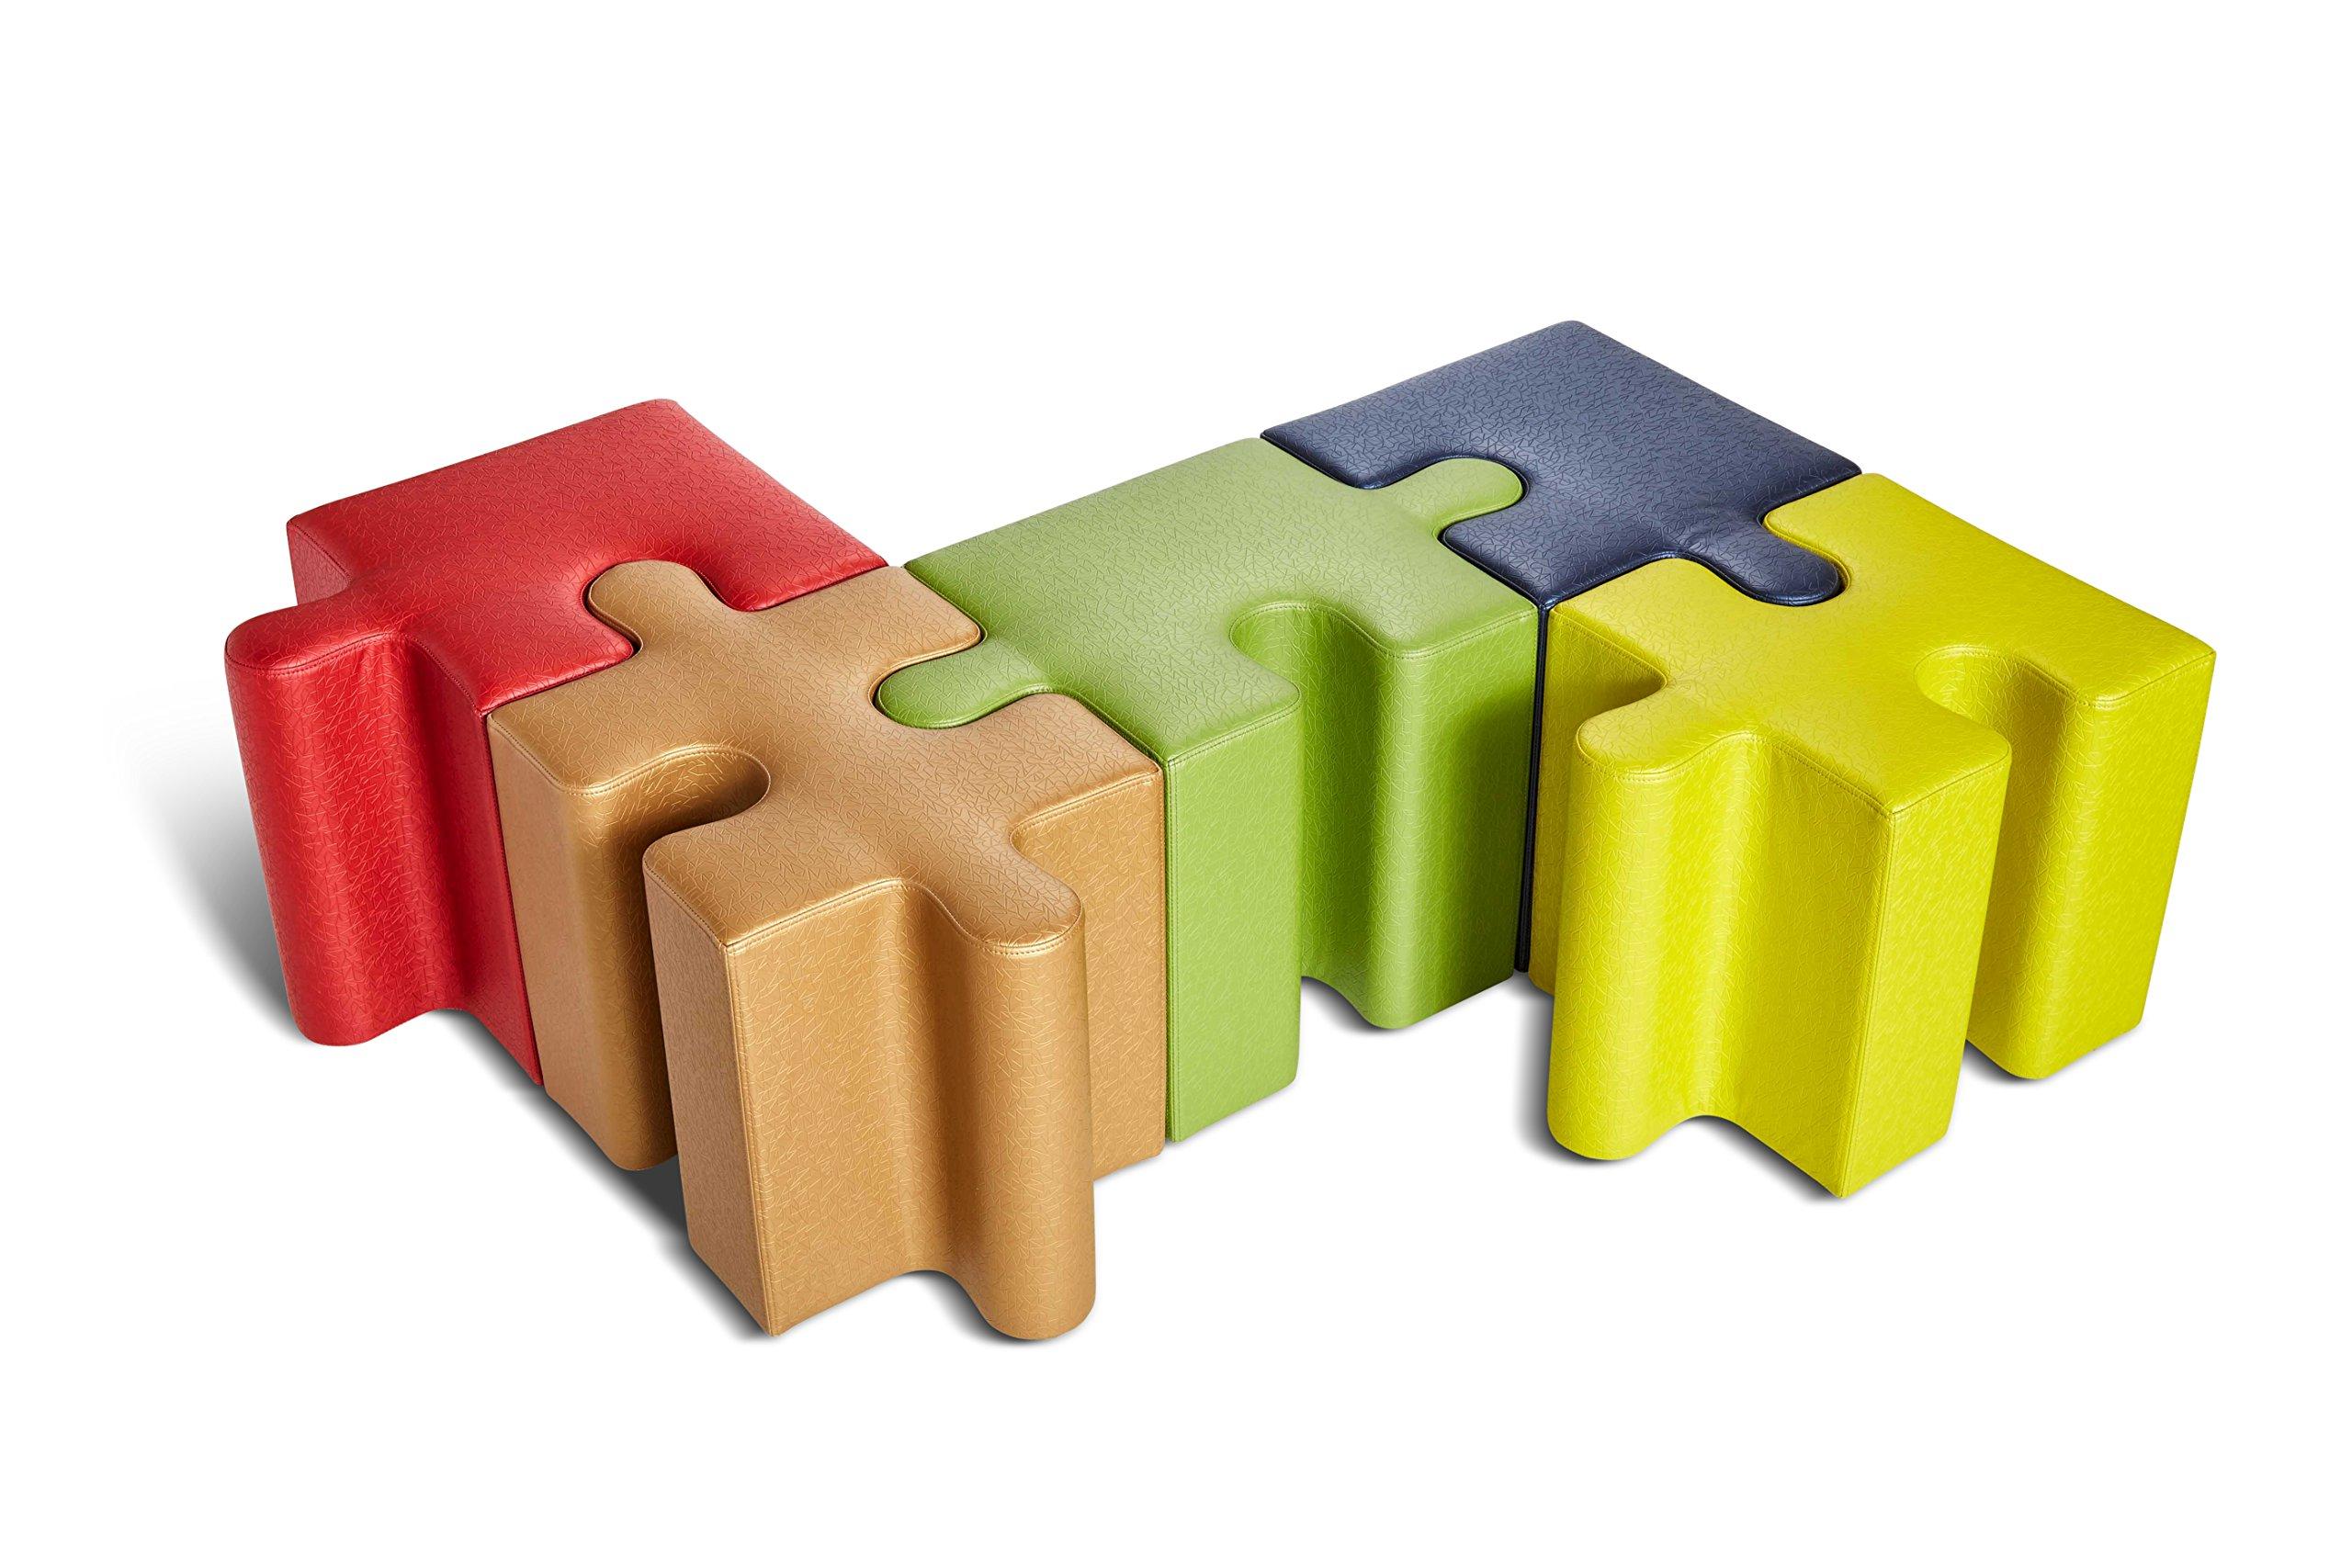 Logic Furniture JIGSTL17 Jigsaw 1 Edge Slot Ottoman, Teal by Logic Furniture (Image #3)